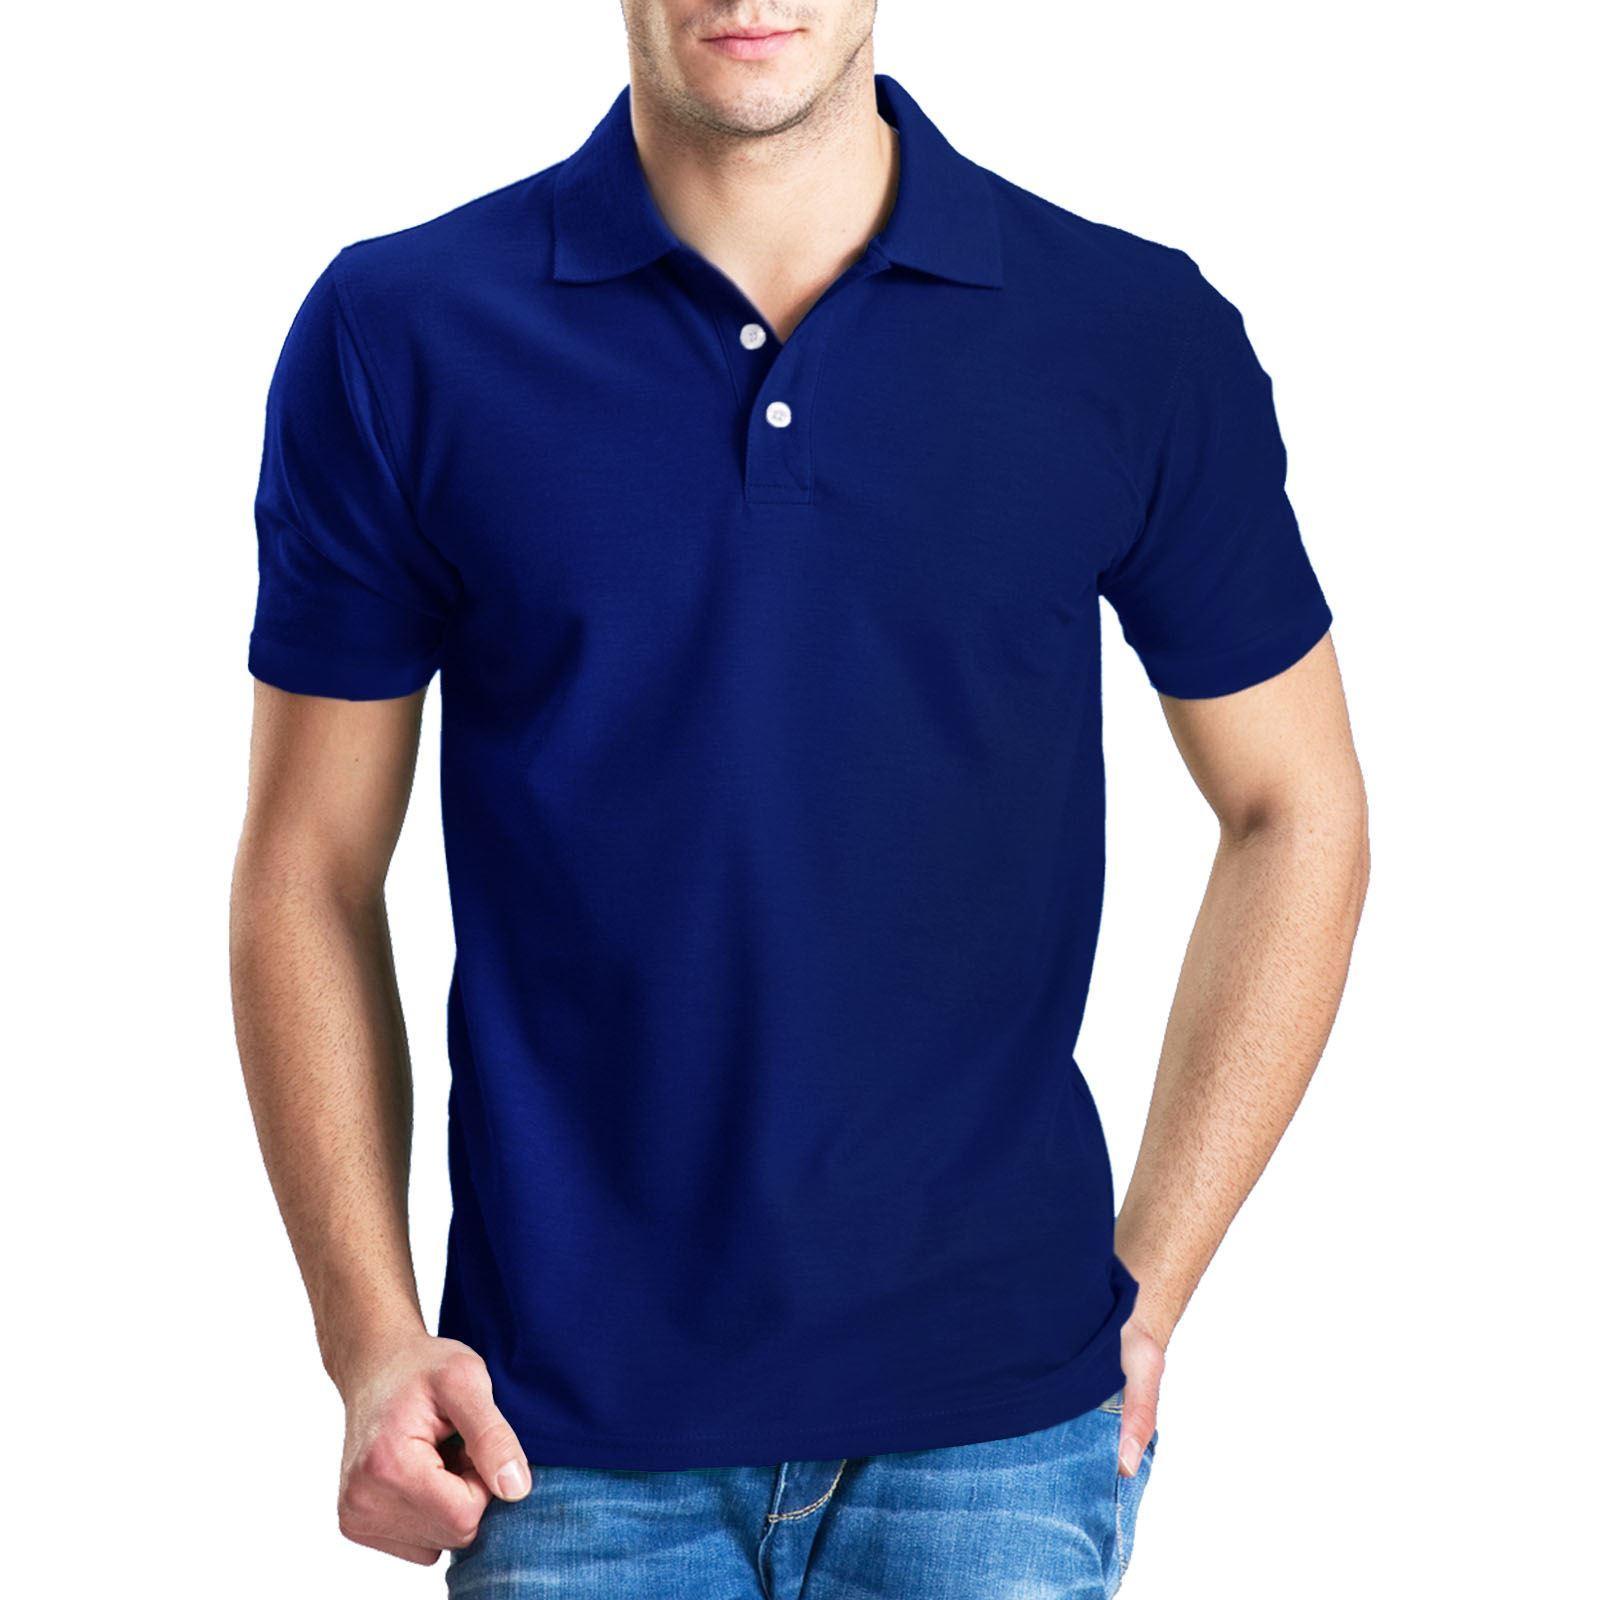 S xxl mens polo tops t shirts short sleeves tees pique for Xxl mens polo shirts